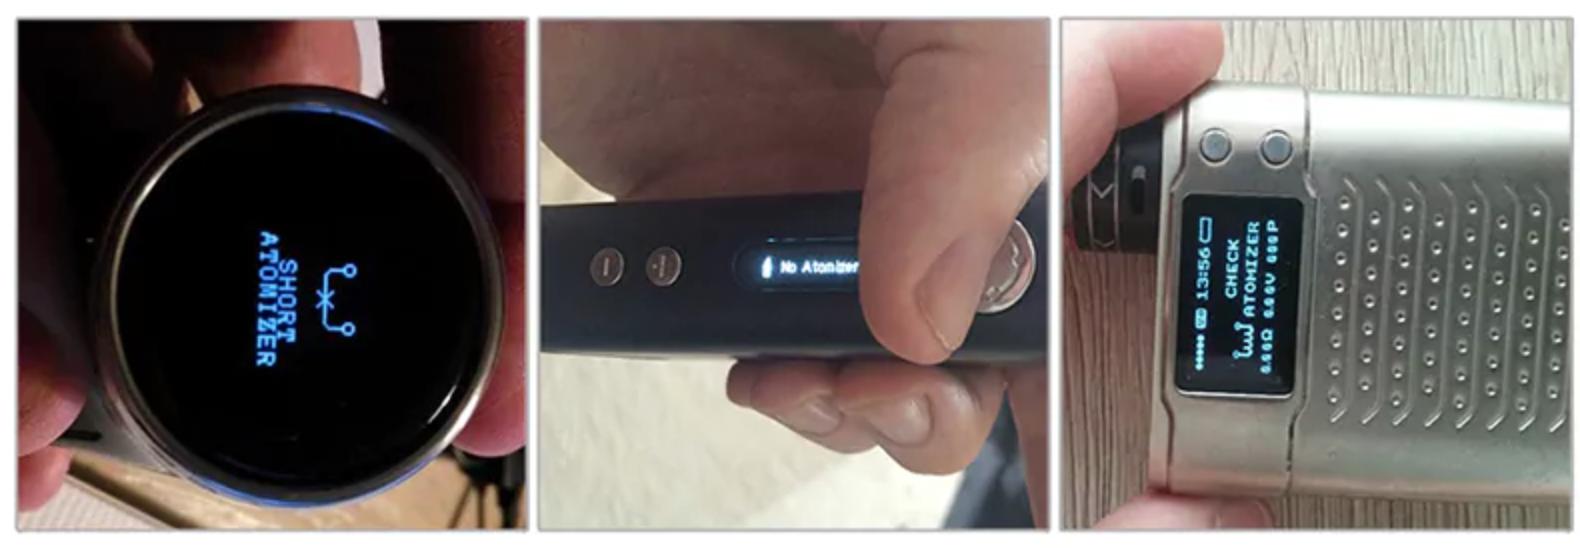 smok mod short atomizer error